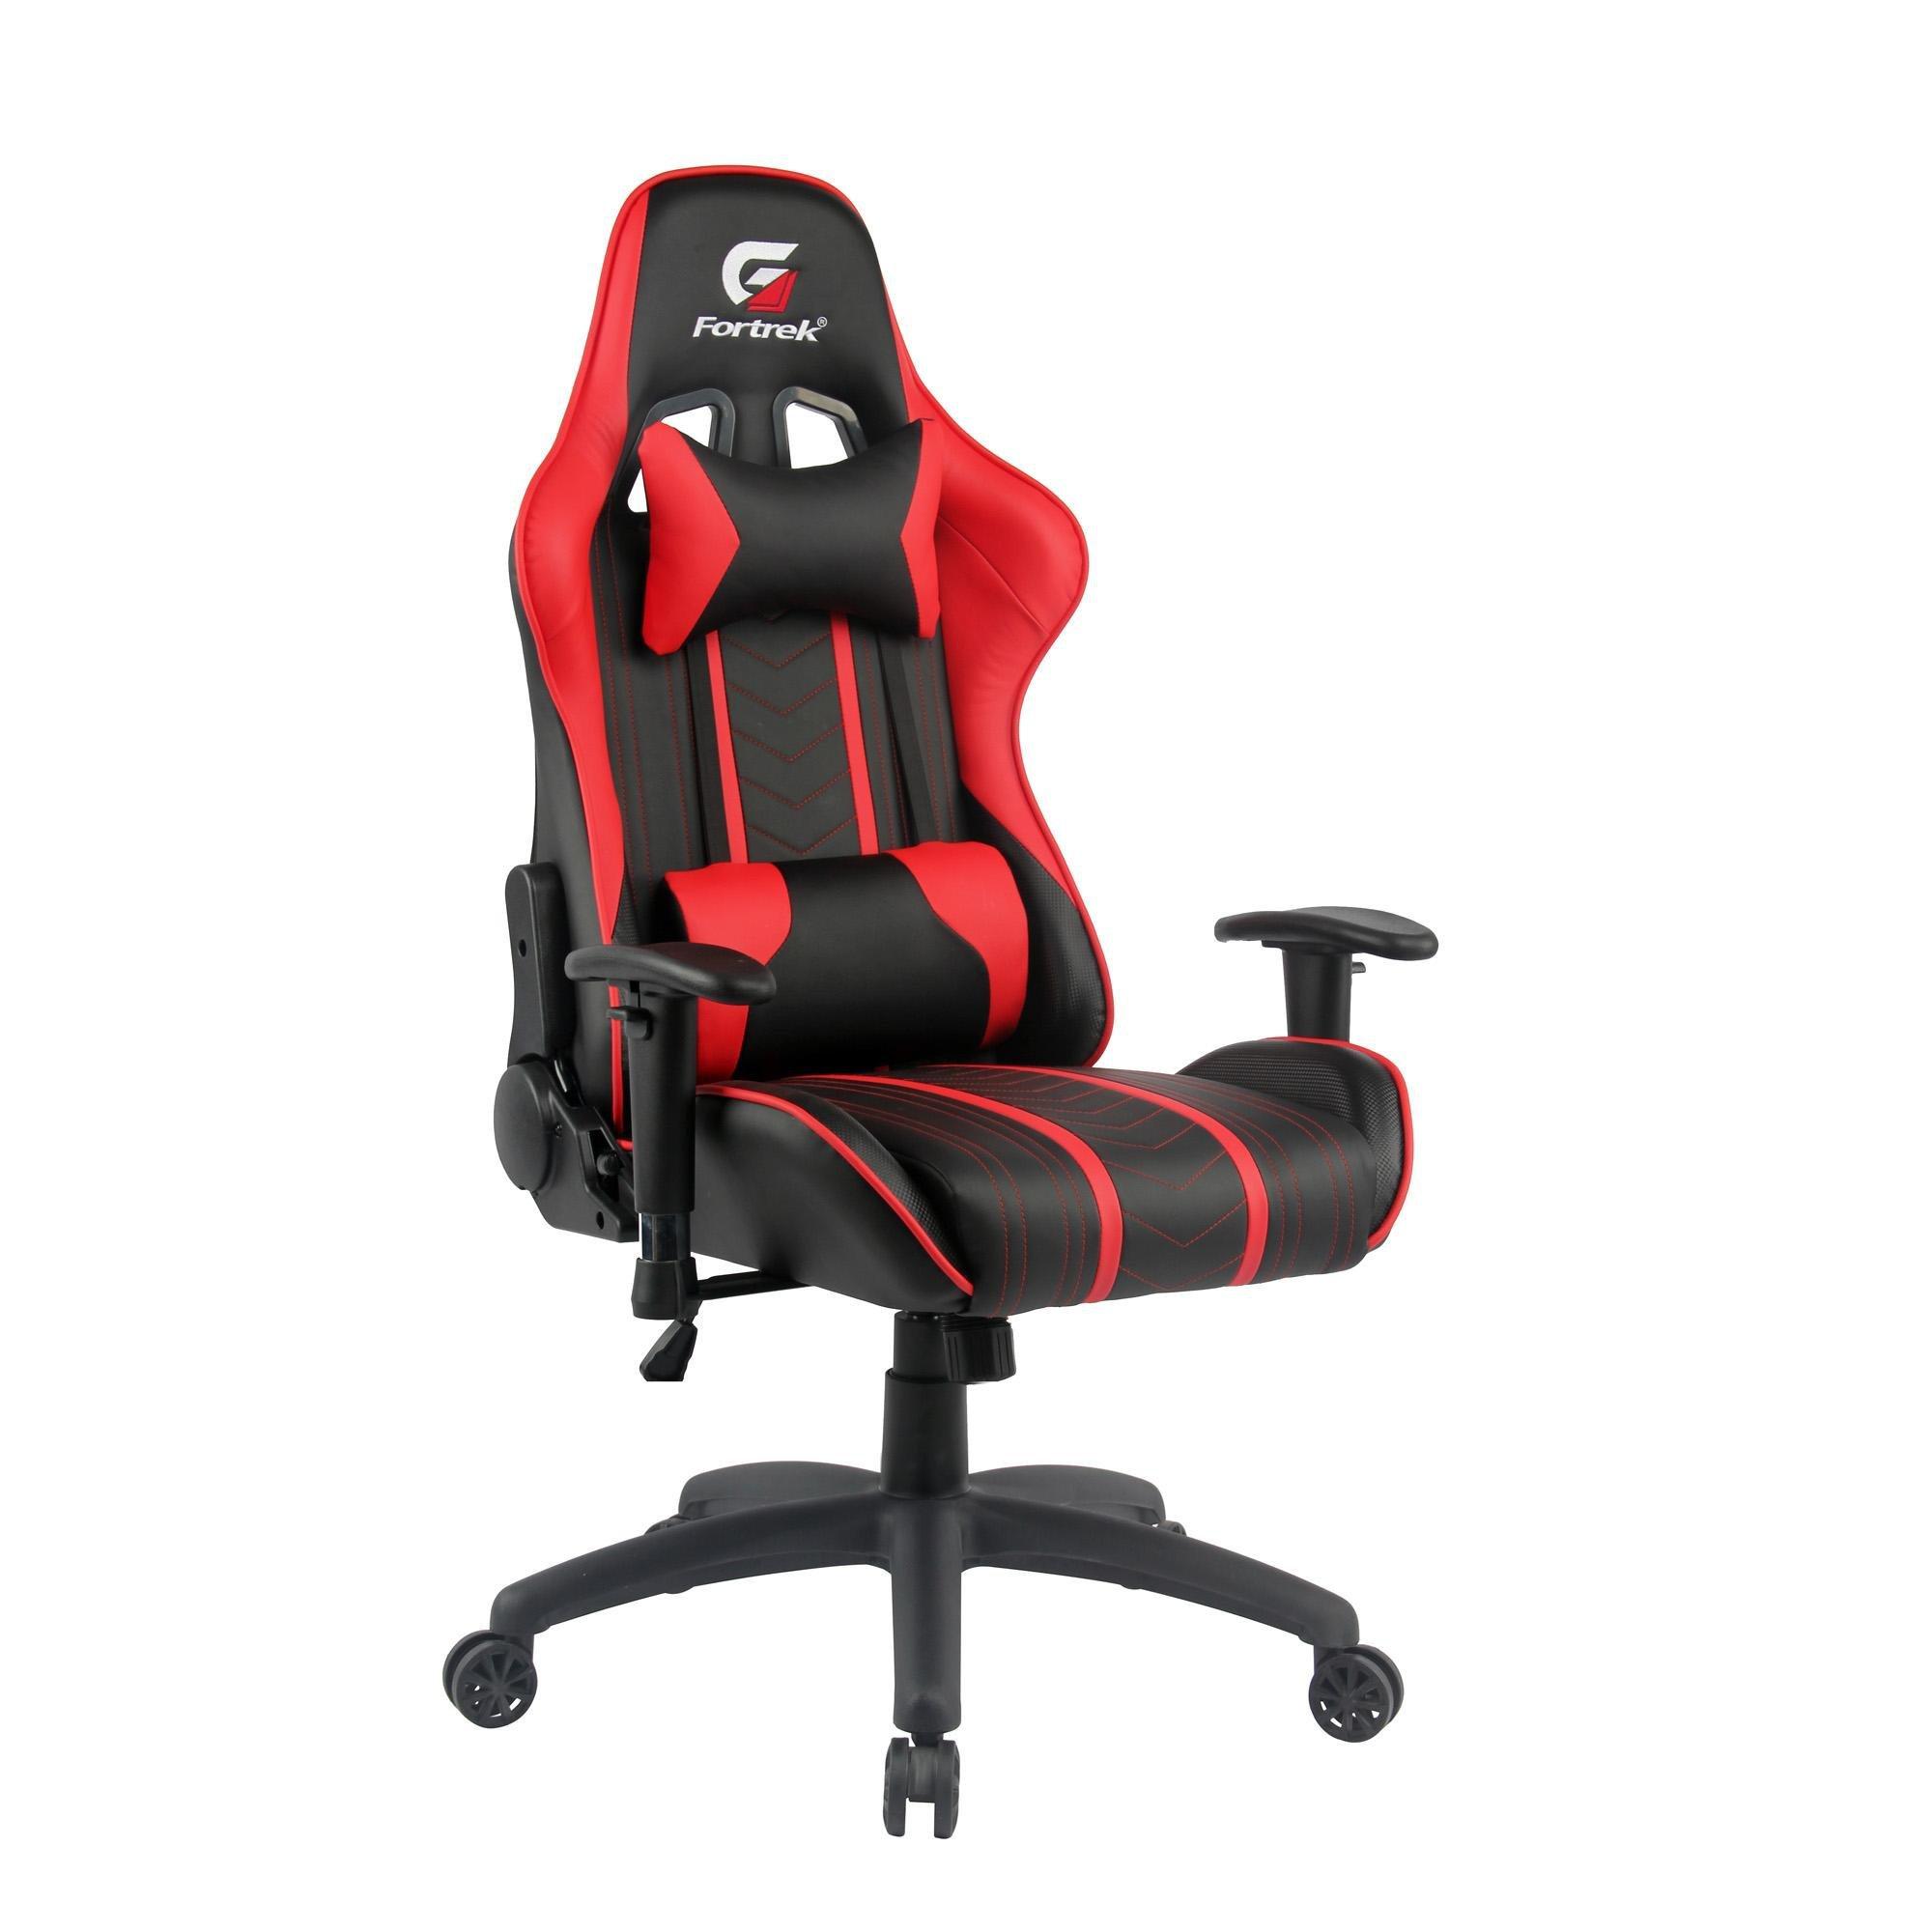 cadeira gamer resultados preta vermelha fortrek black hawk 49881 2000 201060 1